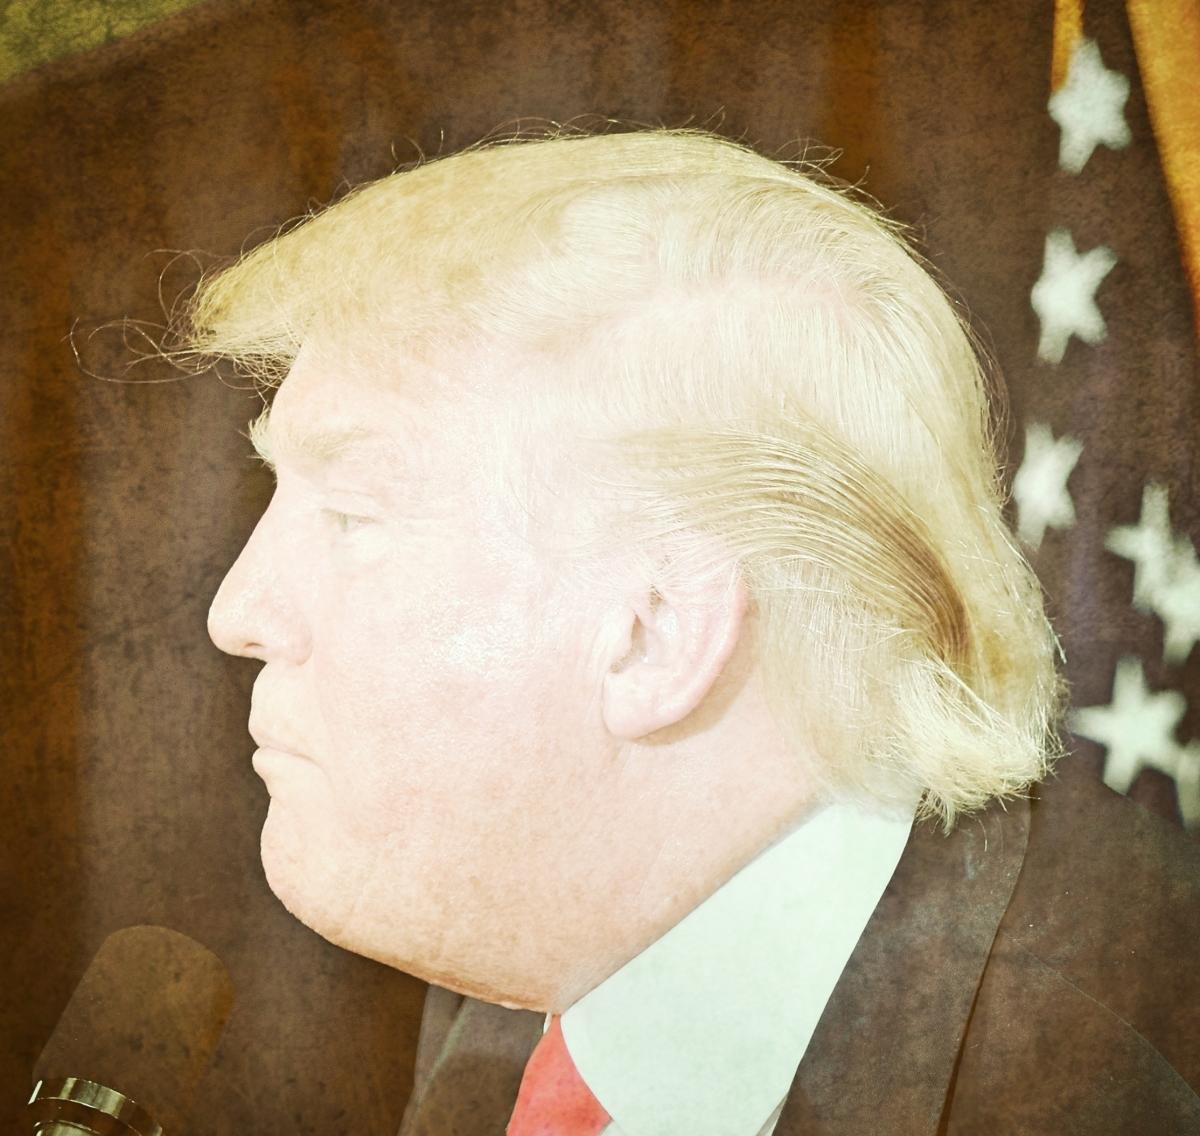 Snarky, Sarcasticky, Profaney Thoughts: Defining the United Fucking States of Fucking Stupid